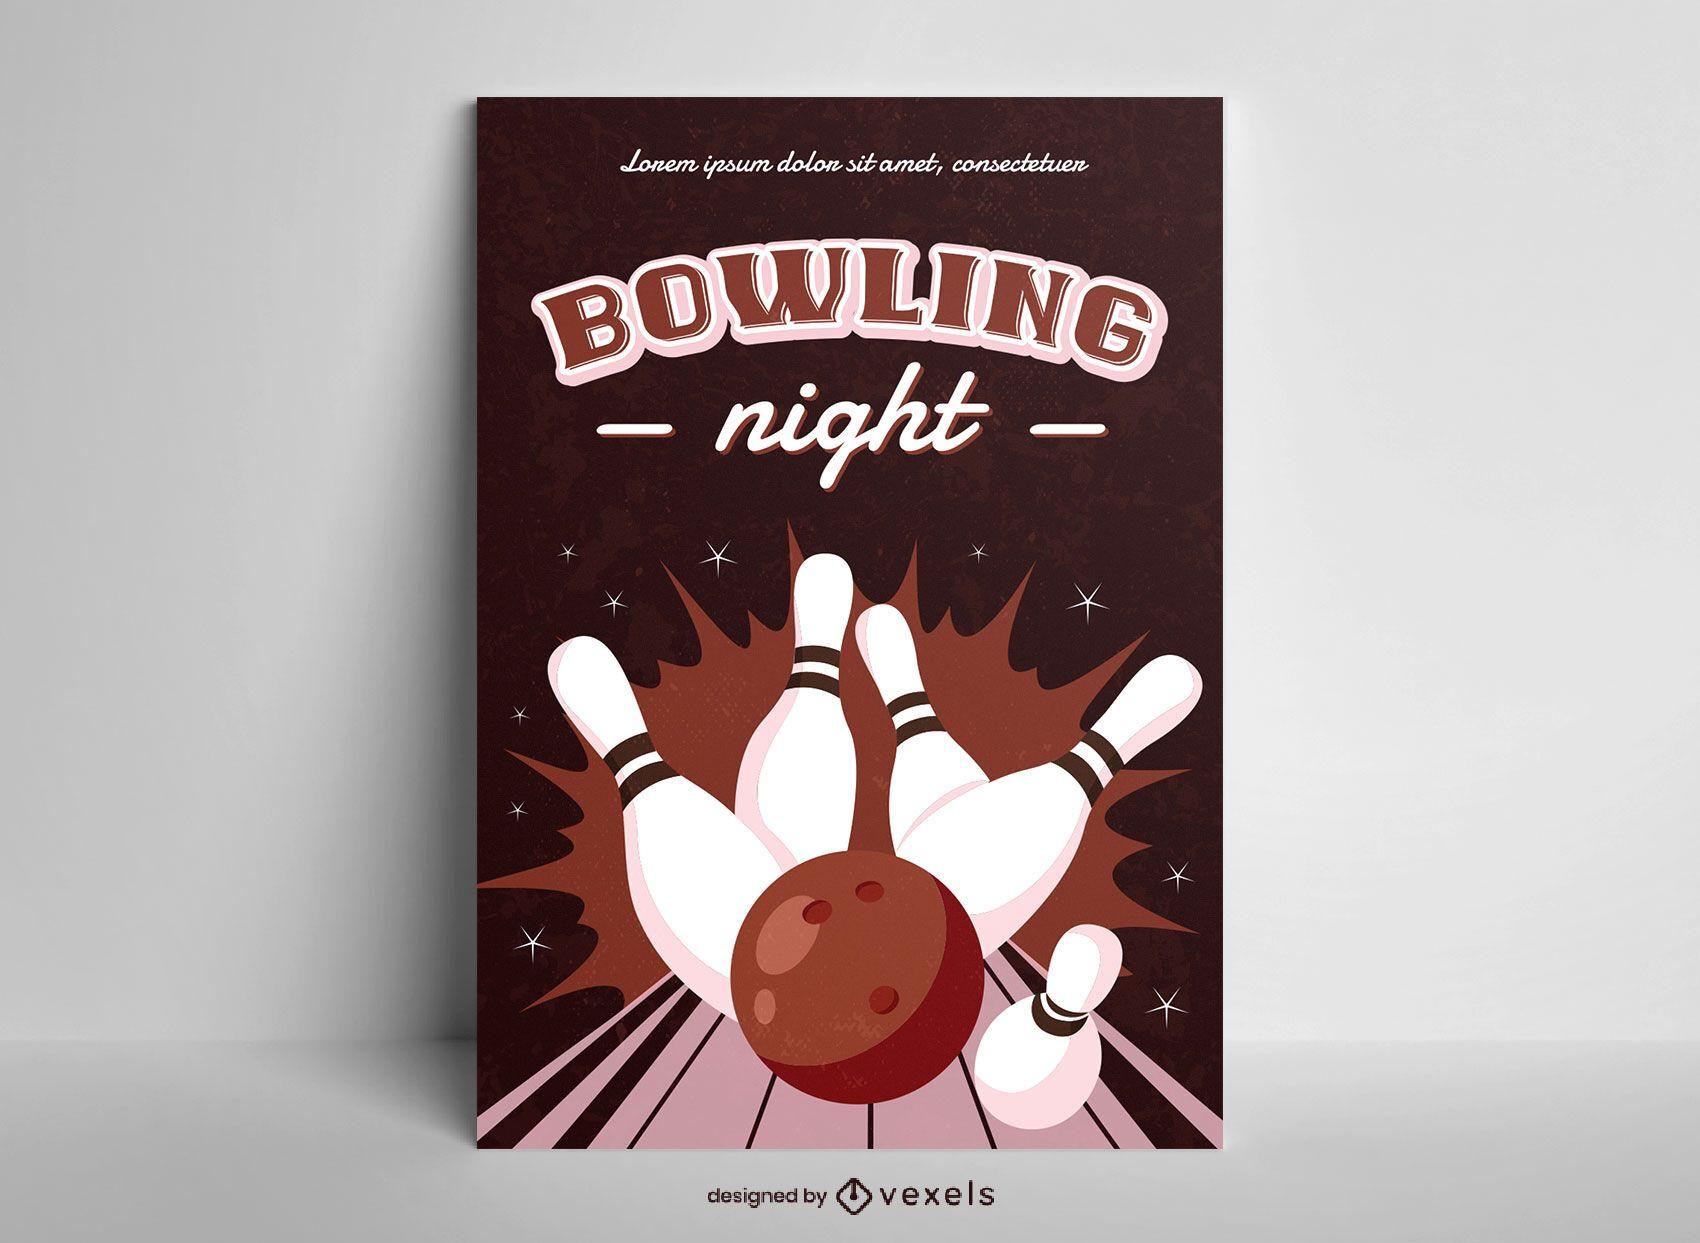 Bowling night semi flat poster design